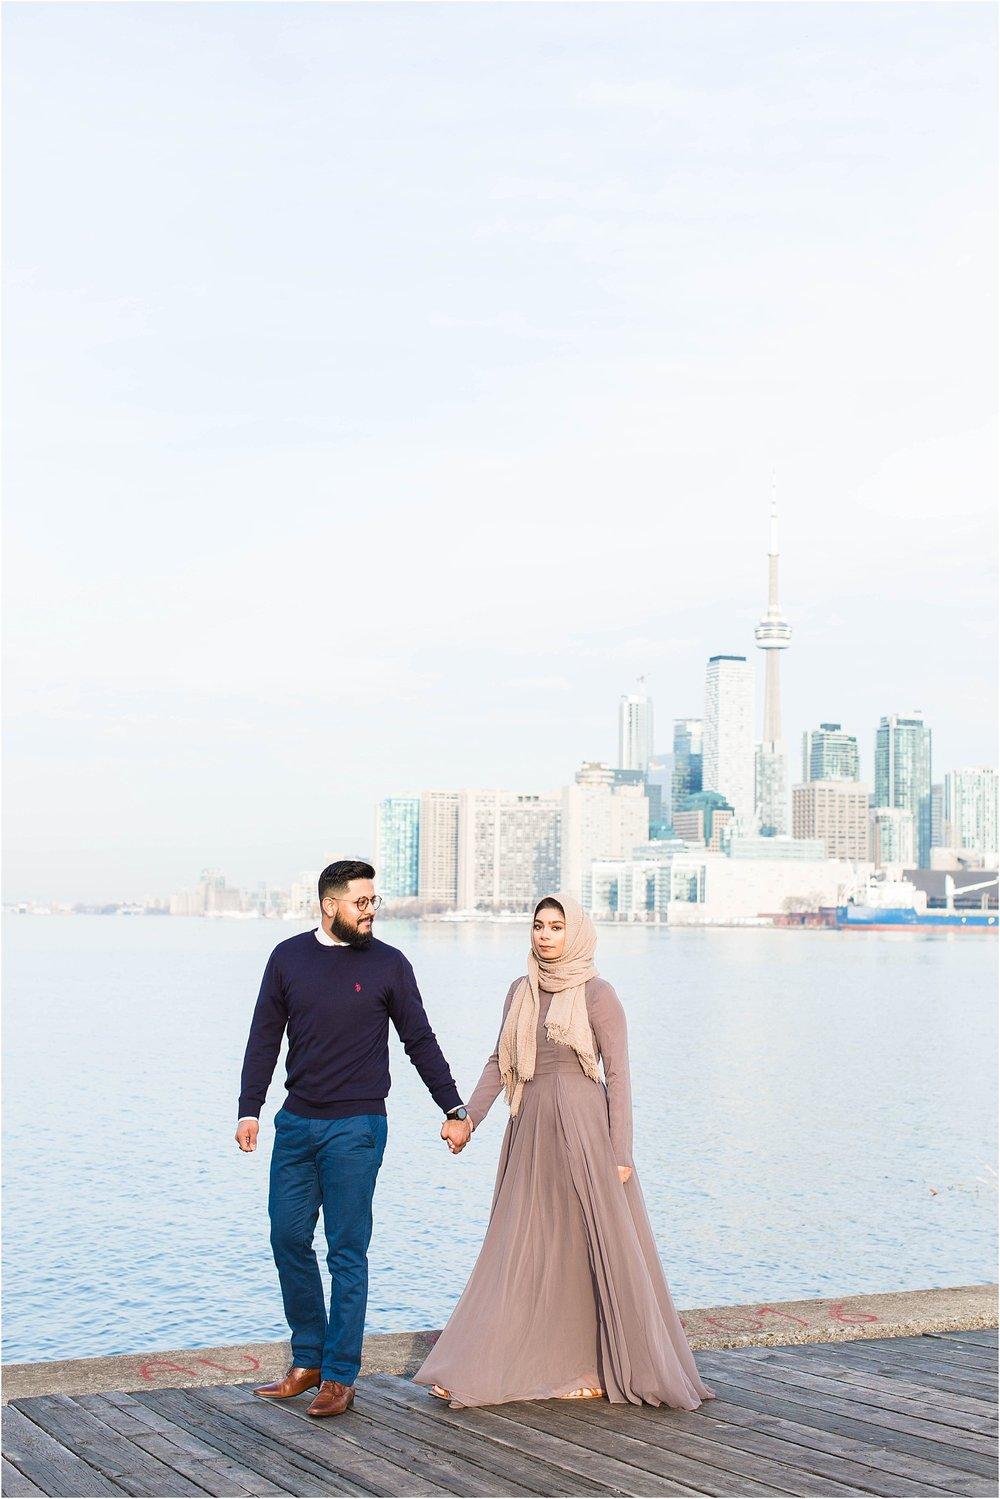 Polson-Pier-Distillery-District-Engagement-Session-Toronto-Mississauga-Brampton-Scarborough-GTA-Pakistani-Indian-Wedding-Engagement-Photographer-Photography_0004.jpg